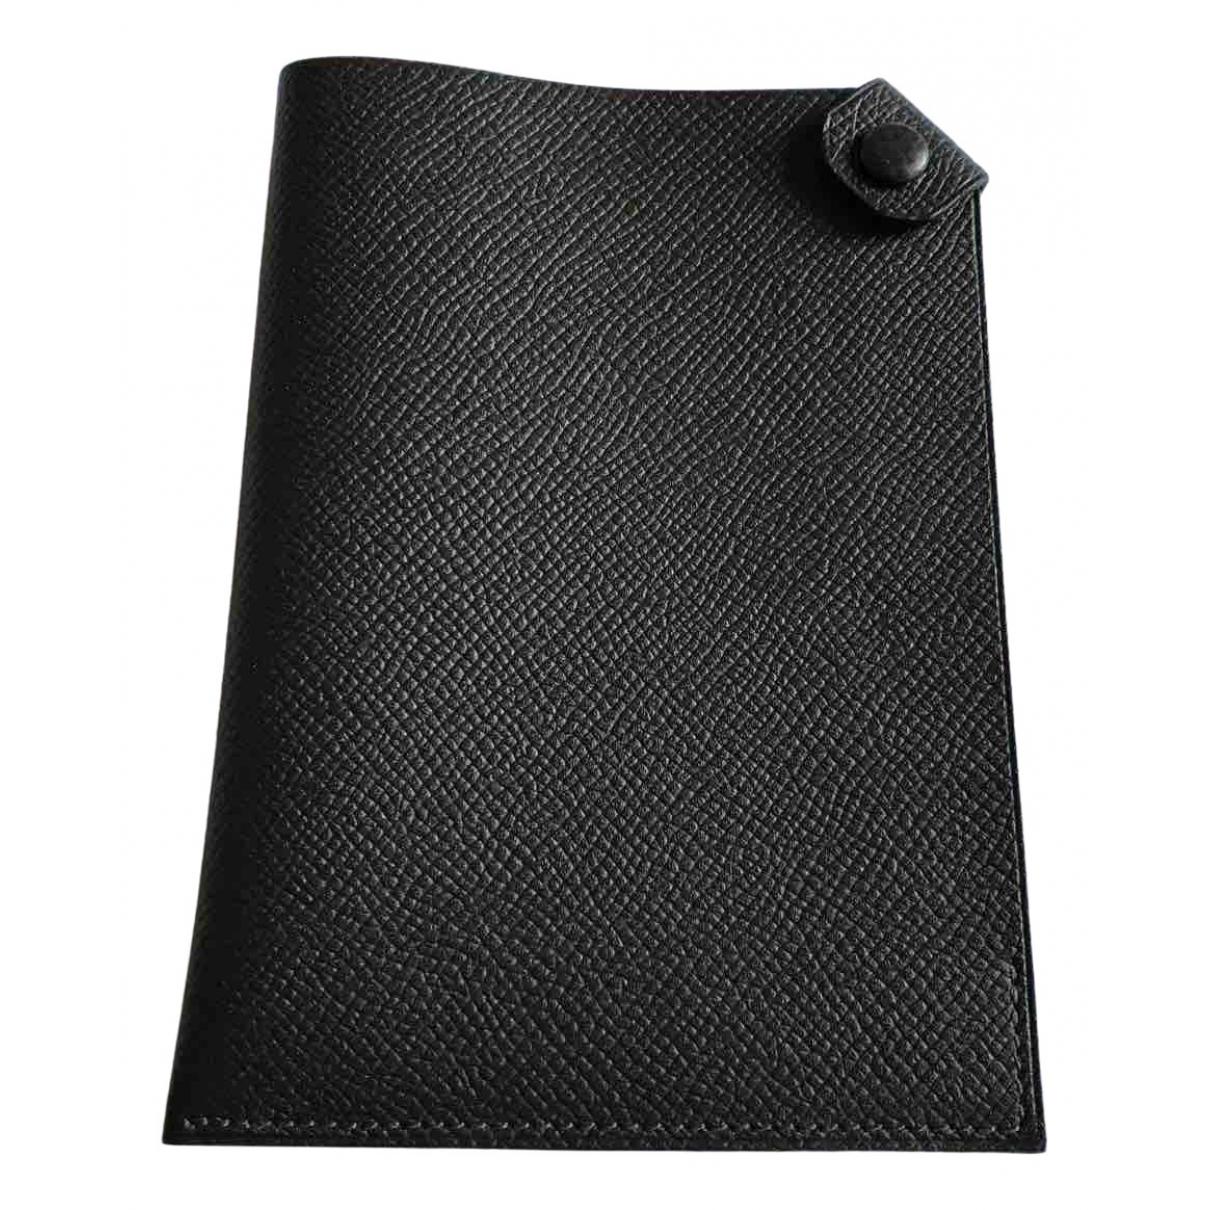 Hermes Tarmac Kleinlederwaren in  Schwarz Leder